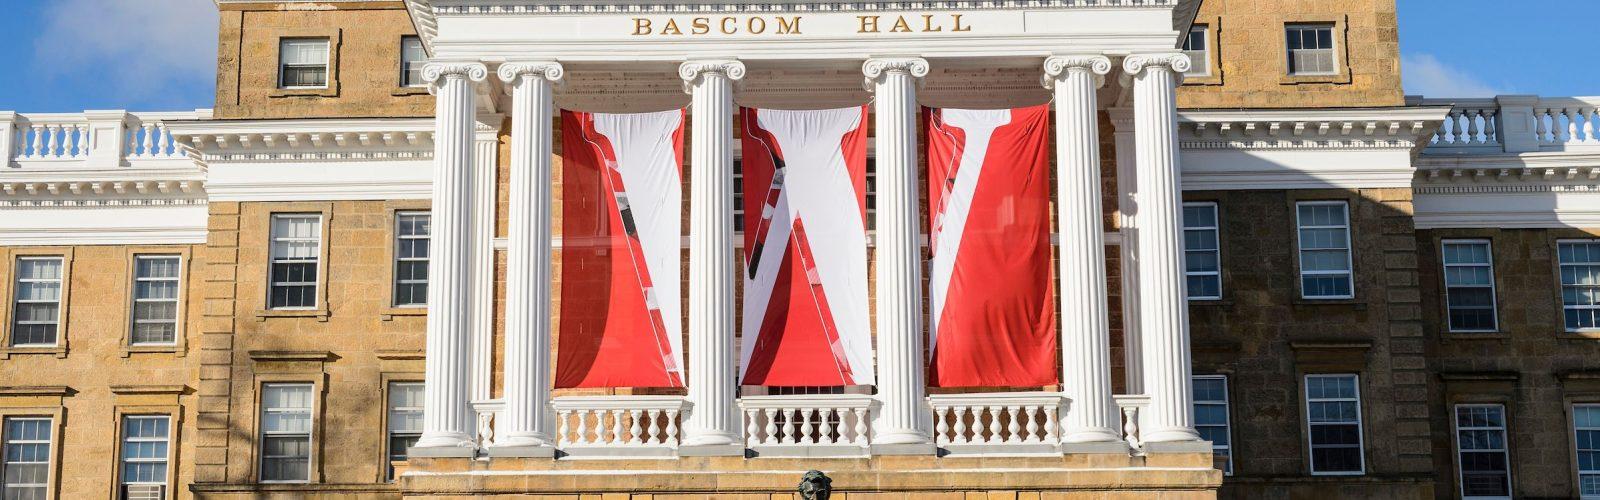 bascom hall with W banner